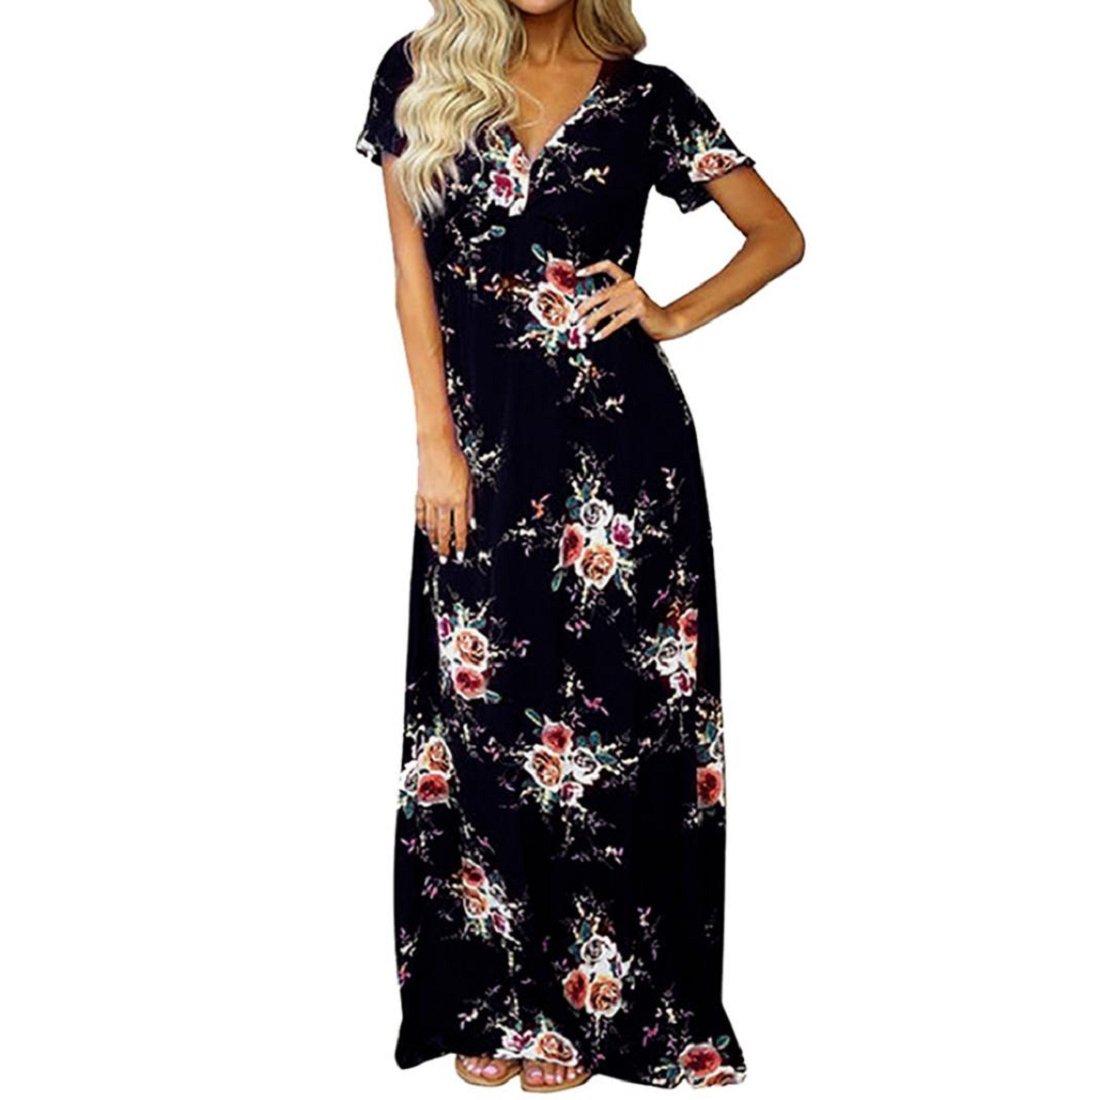 PAOLIAN Sommerkleider Damen Chiffon Lange Maxi Strandkleid Sundress Frauen Boho Floral Elegant langes Abendkleid Cocktailkleid Partykleid Kleid